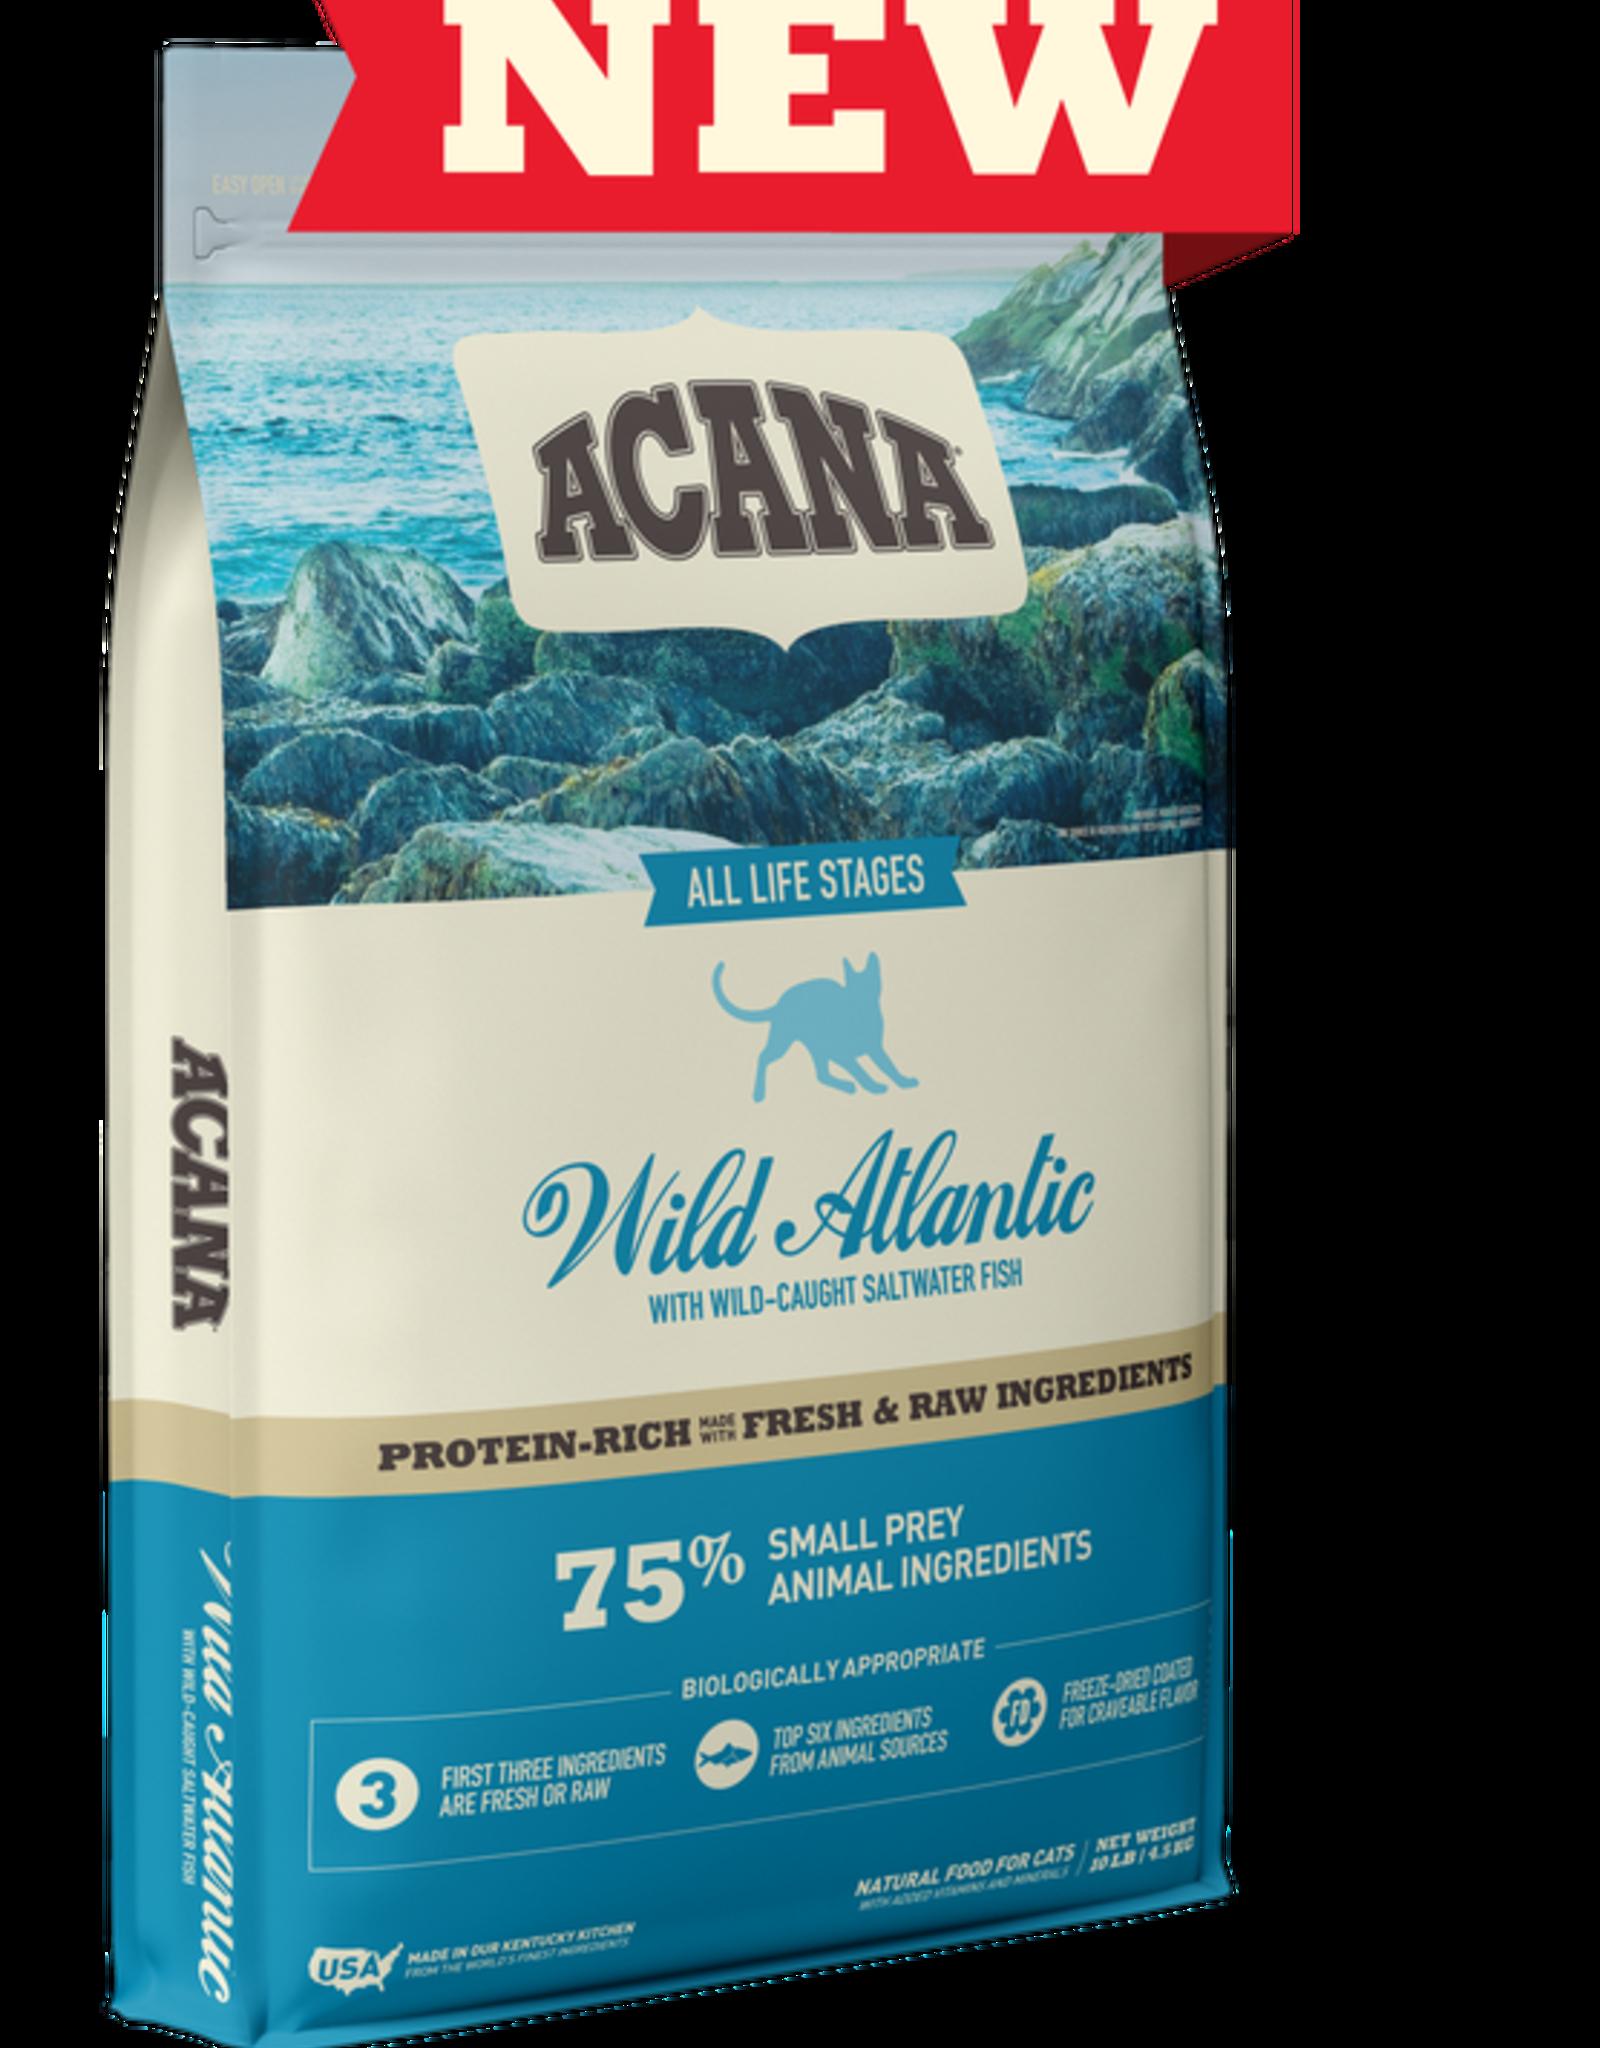 Acana Cat Wild Atlantic - Grain-Free 4lb